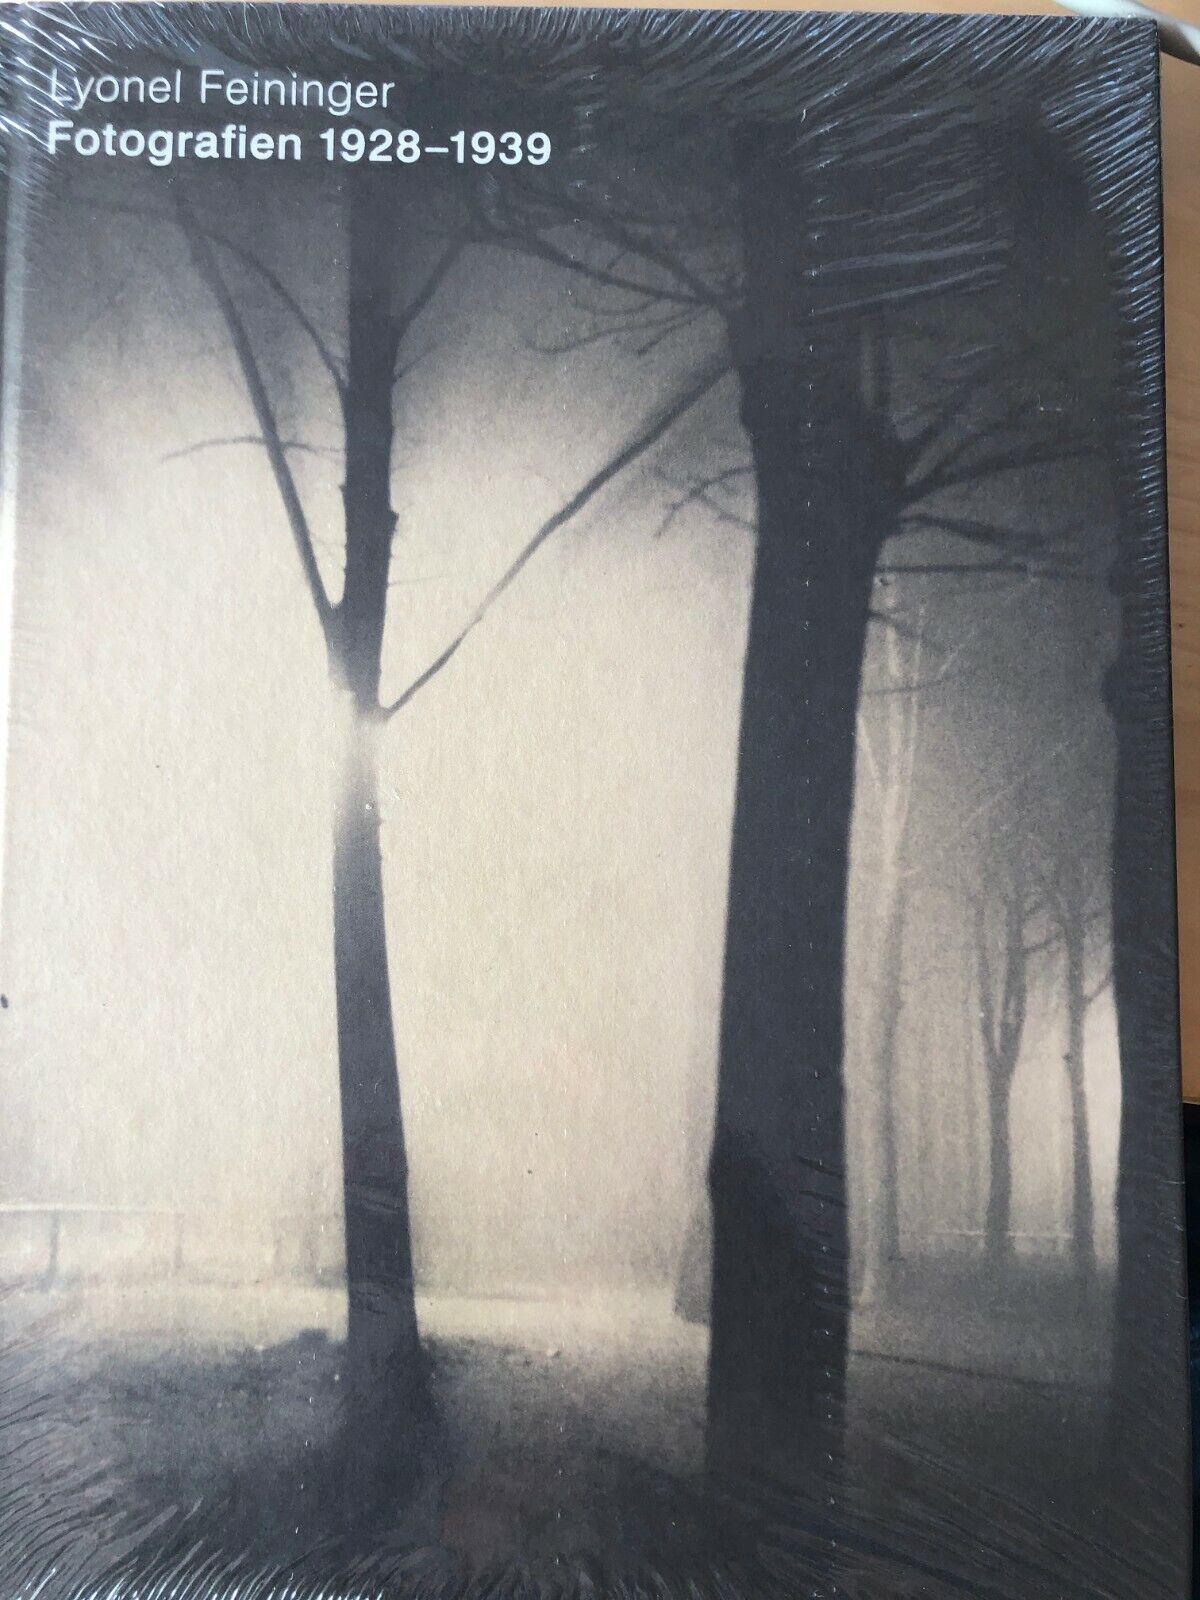 Lionel Feininger Fotografien 1928-1939. Neu in OFolie